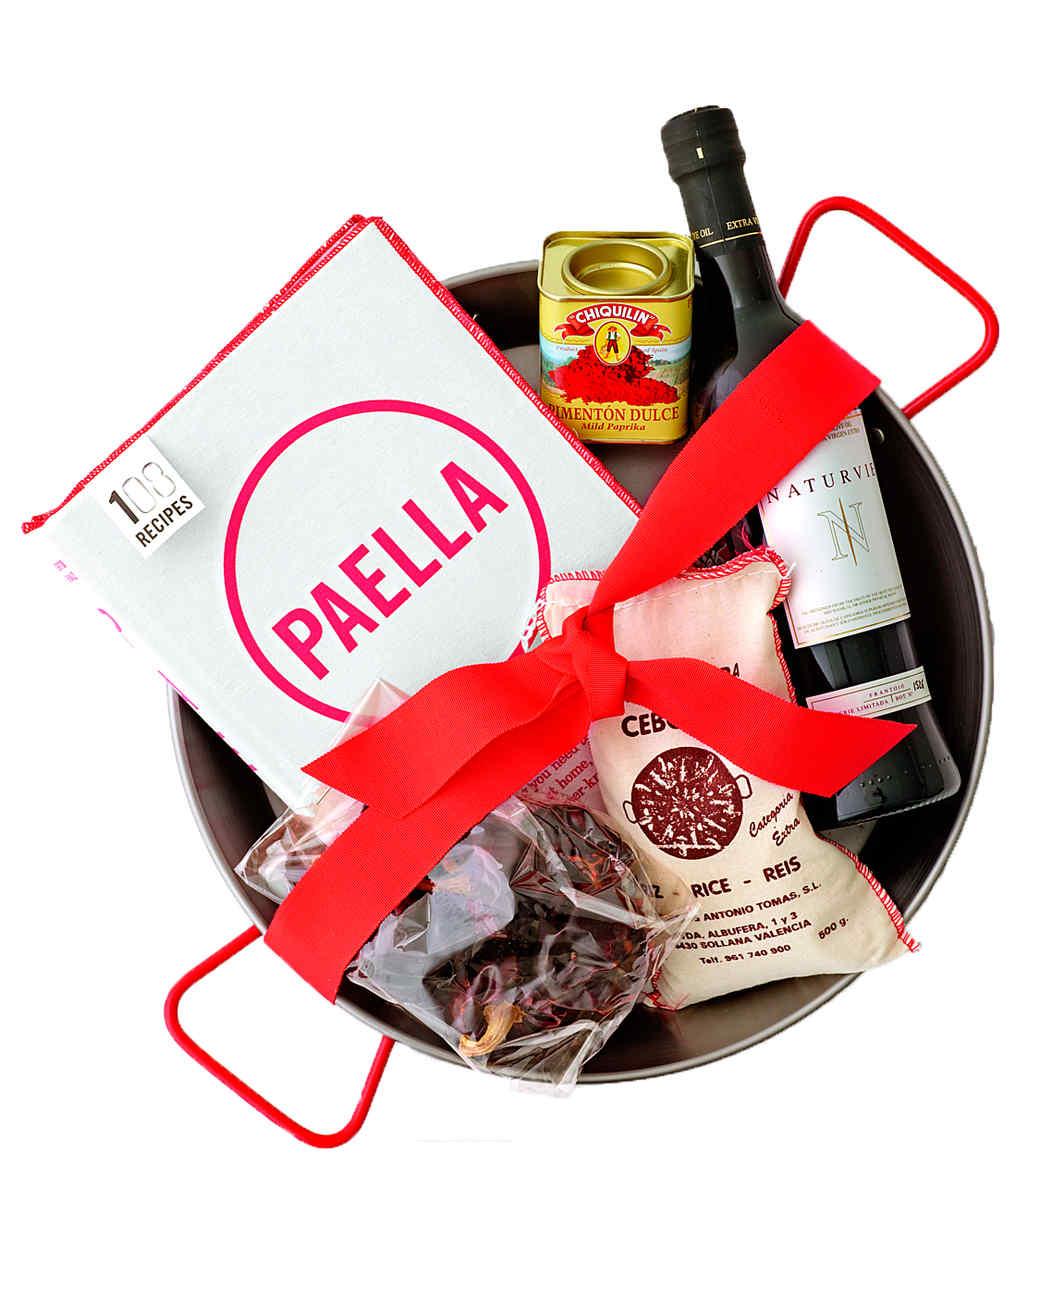 paella-kit-mld107746.jpg